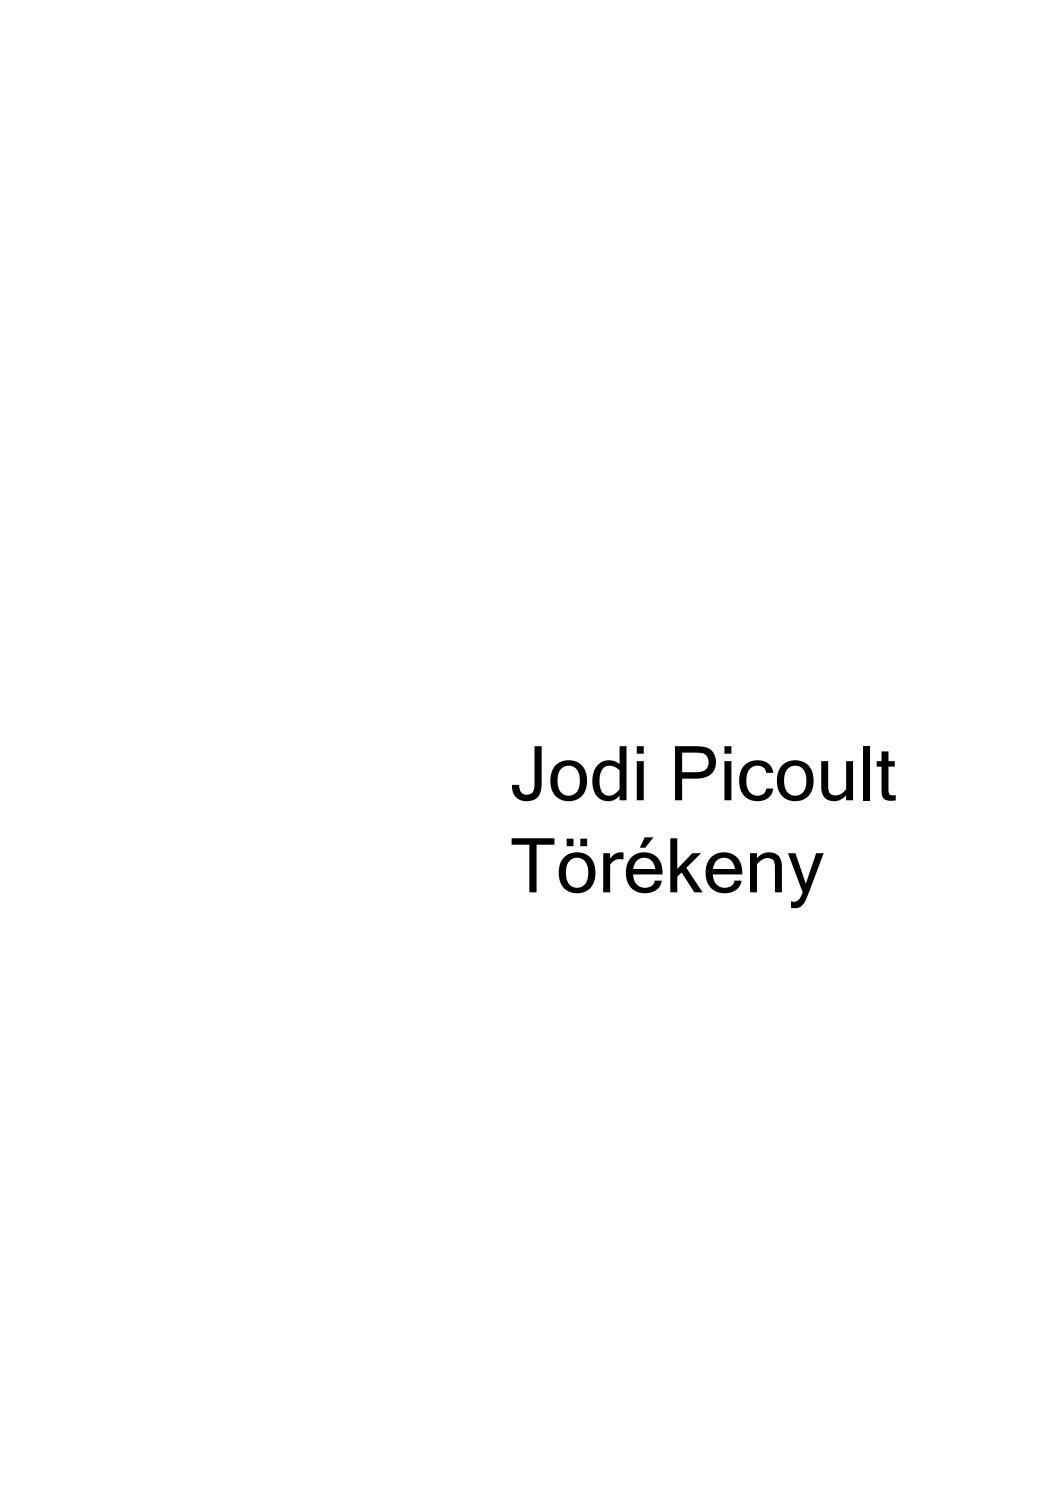 Jodi Picoult Törékeny by Asima - issuu 7254352b87